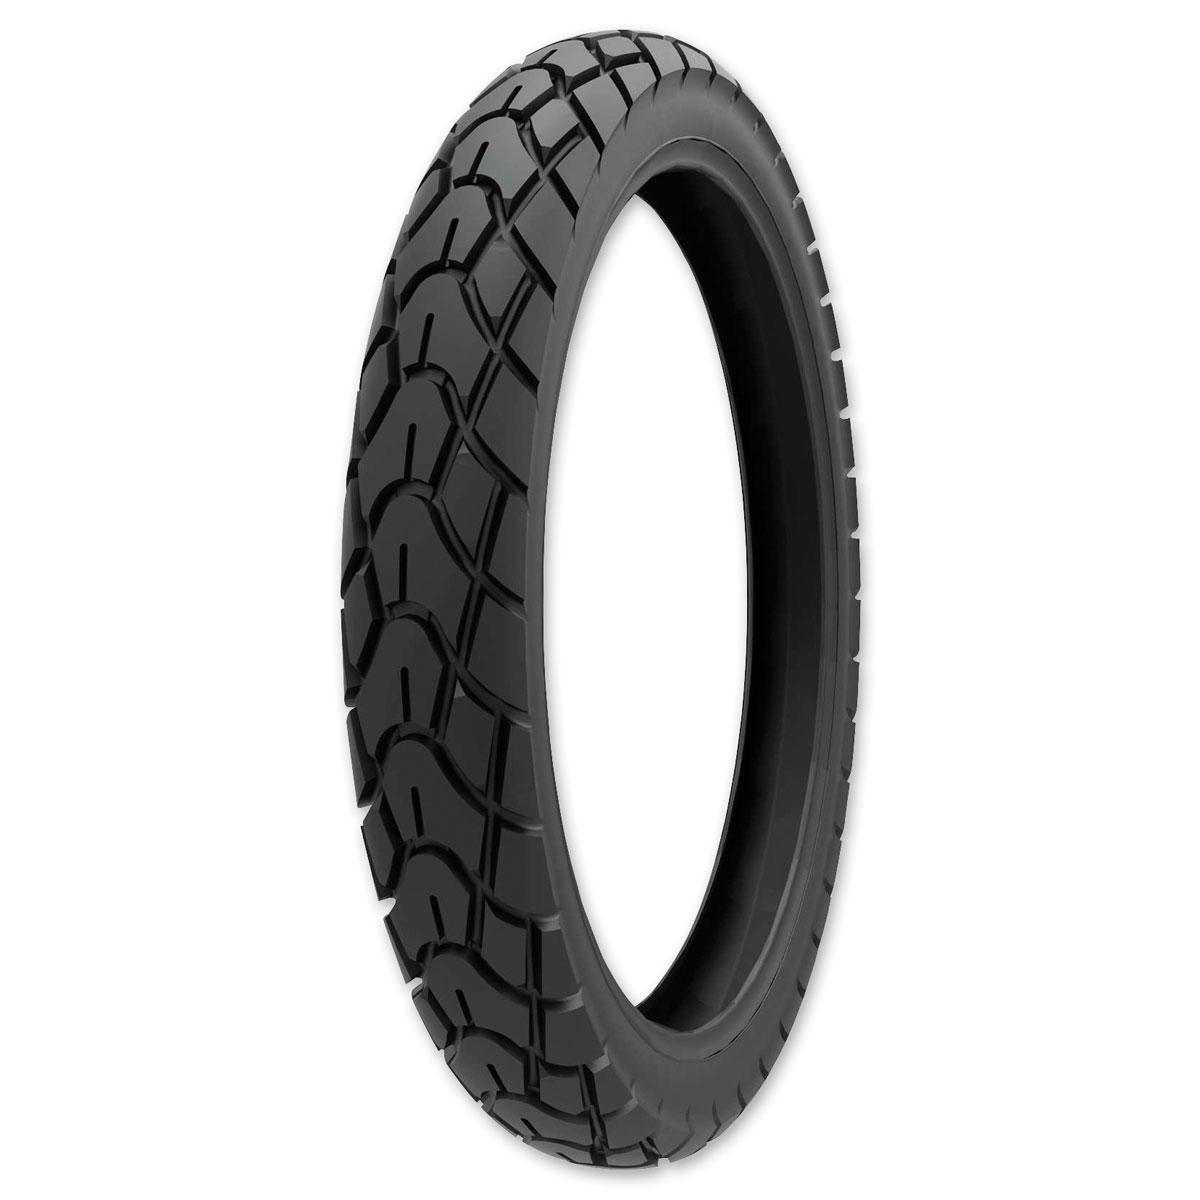 Kenda Tires K761 100/90-19 Front/Rear Tire